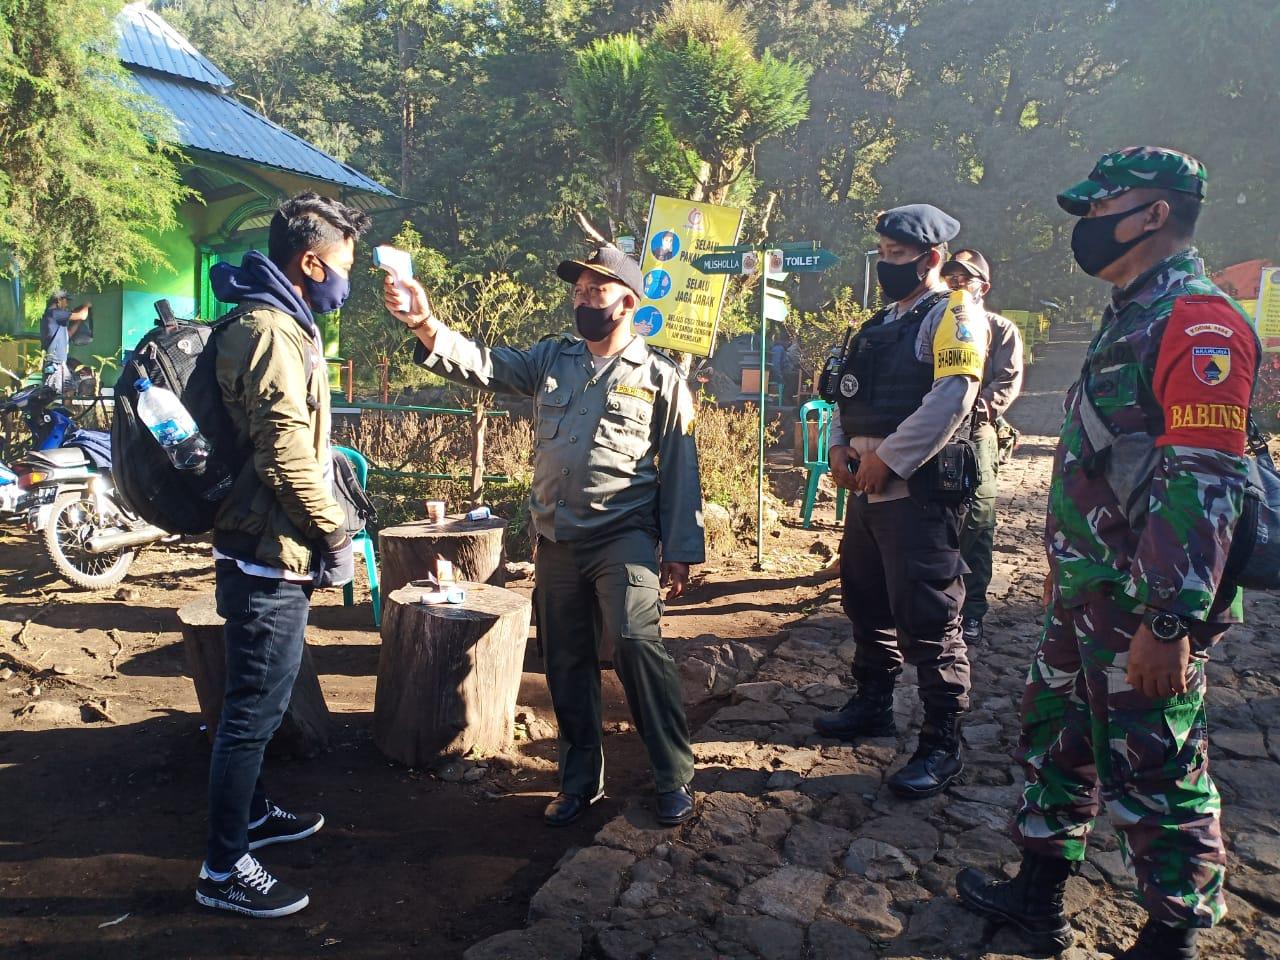 Jalur Pendakian Gunung Lawu Via Cemoro Sewu Dibuka Kembali Beritatrends Com